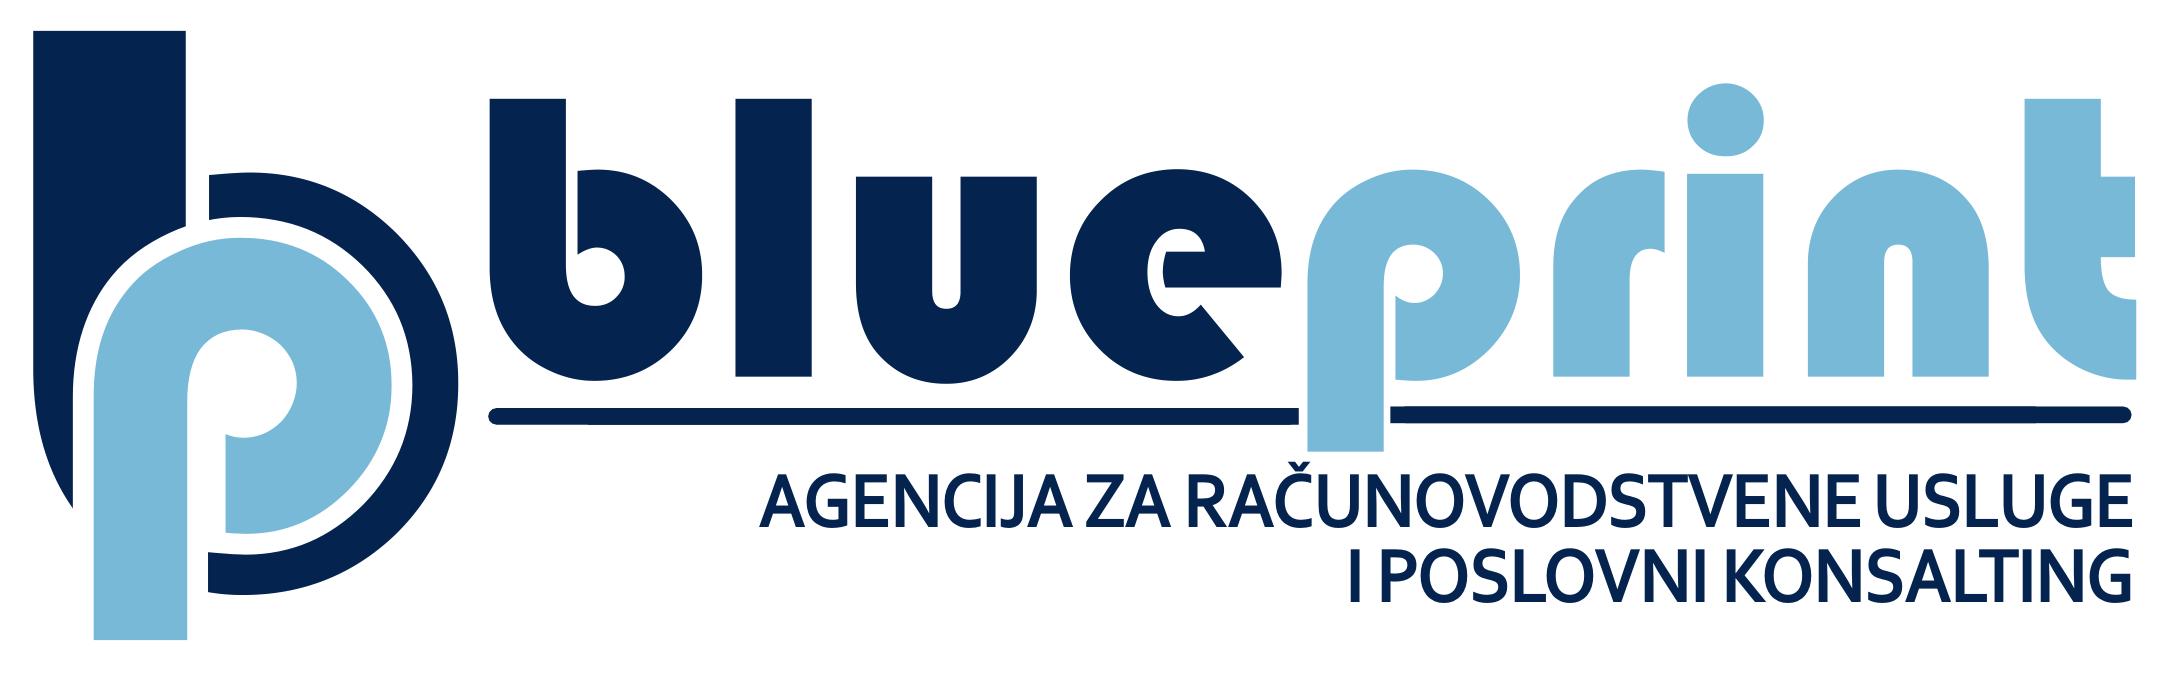 Računovodstvena agencija Blueprint d.o.o.